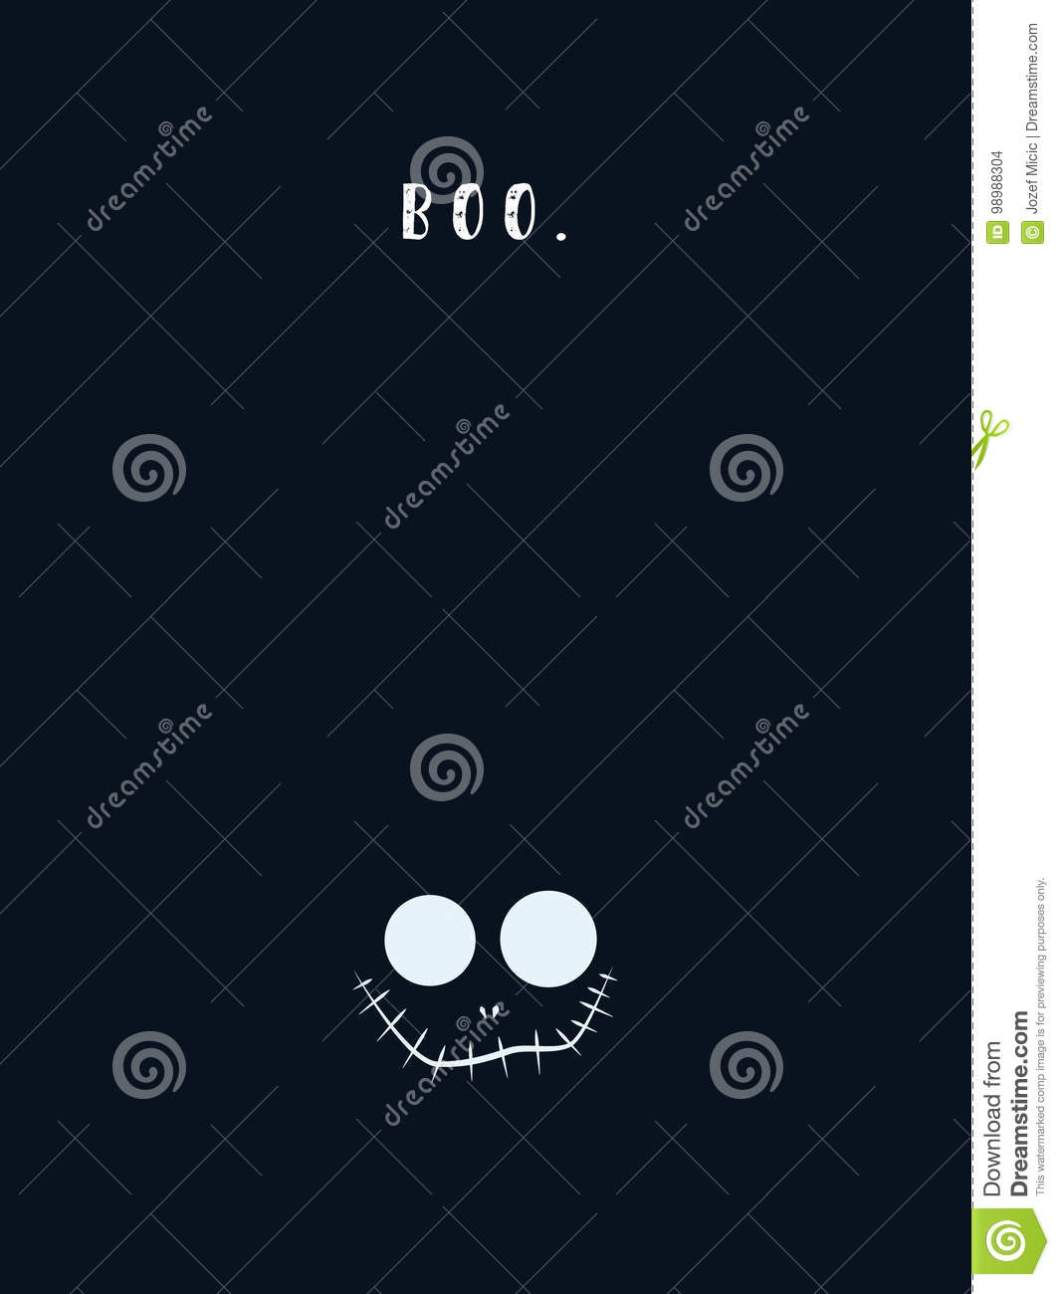 Scary Halloween Eyes Template | Cartooncreative.co